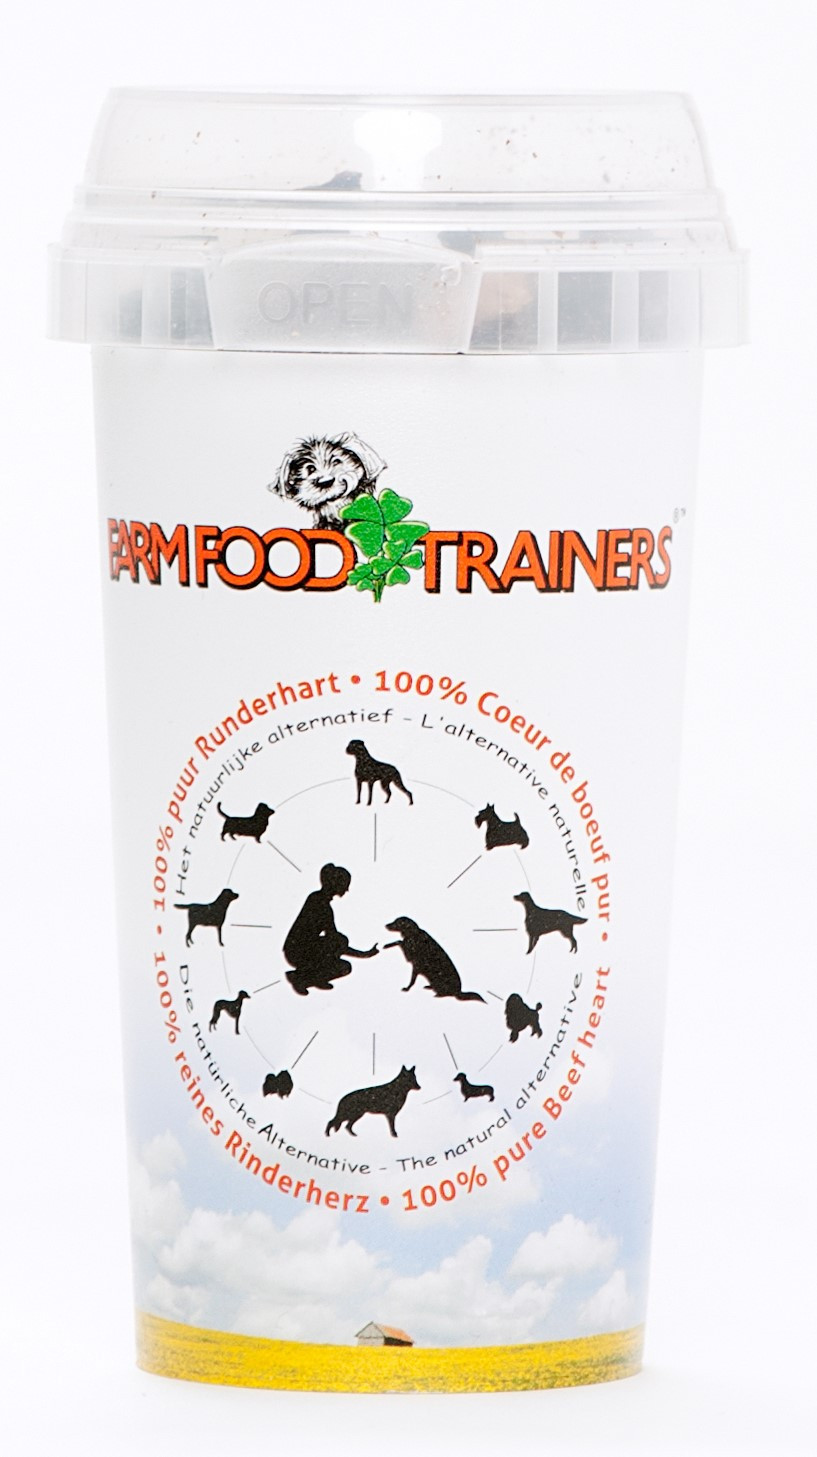 Farm Food Trainers <br>90 gr